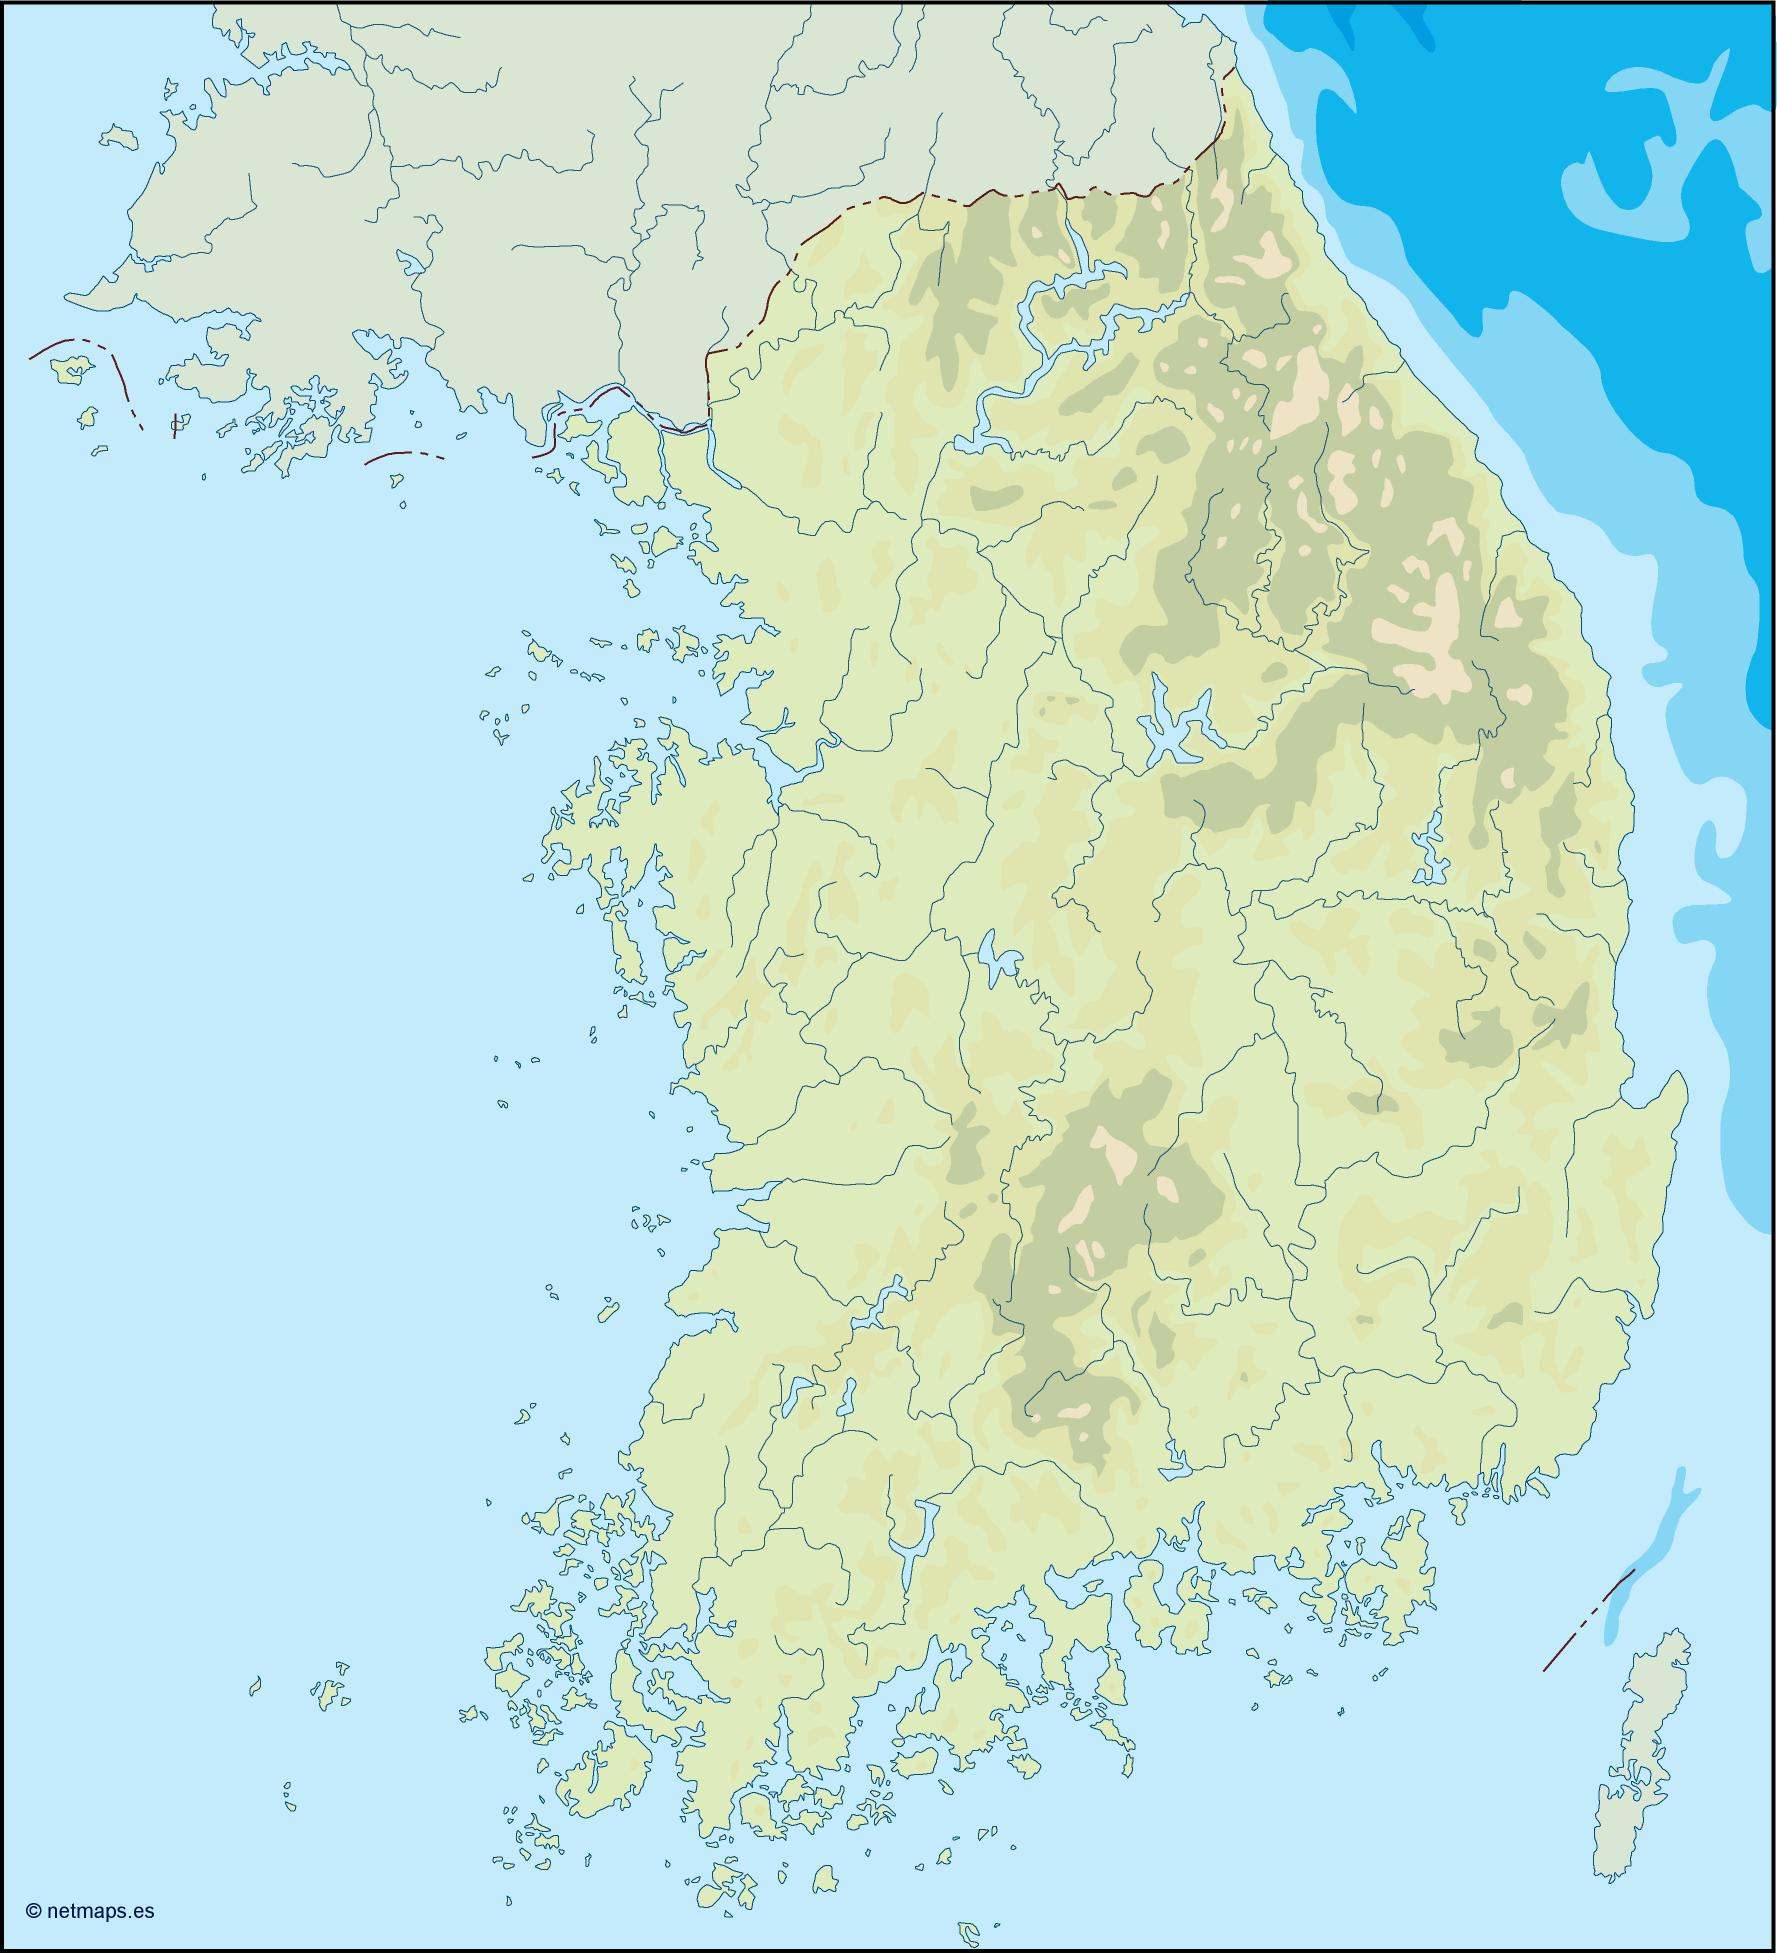 Korea World Map Online on incheon korea, ocean world korea, in which continent is korea, bambino korea, us bases korea, mark lippert korea, north korea, world hotel korea, location of korea, daum korea, mers korea, nerium korea, itaewon korea, world flag korea, army posts in korea, south korea, old korea,